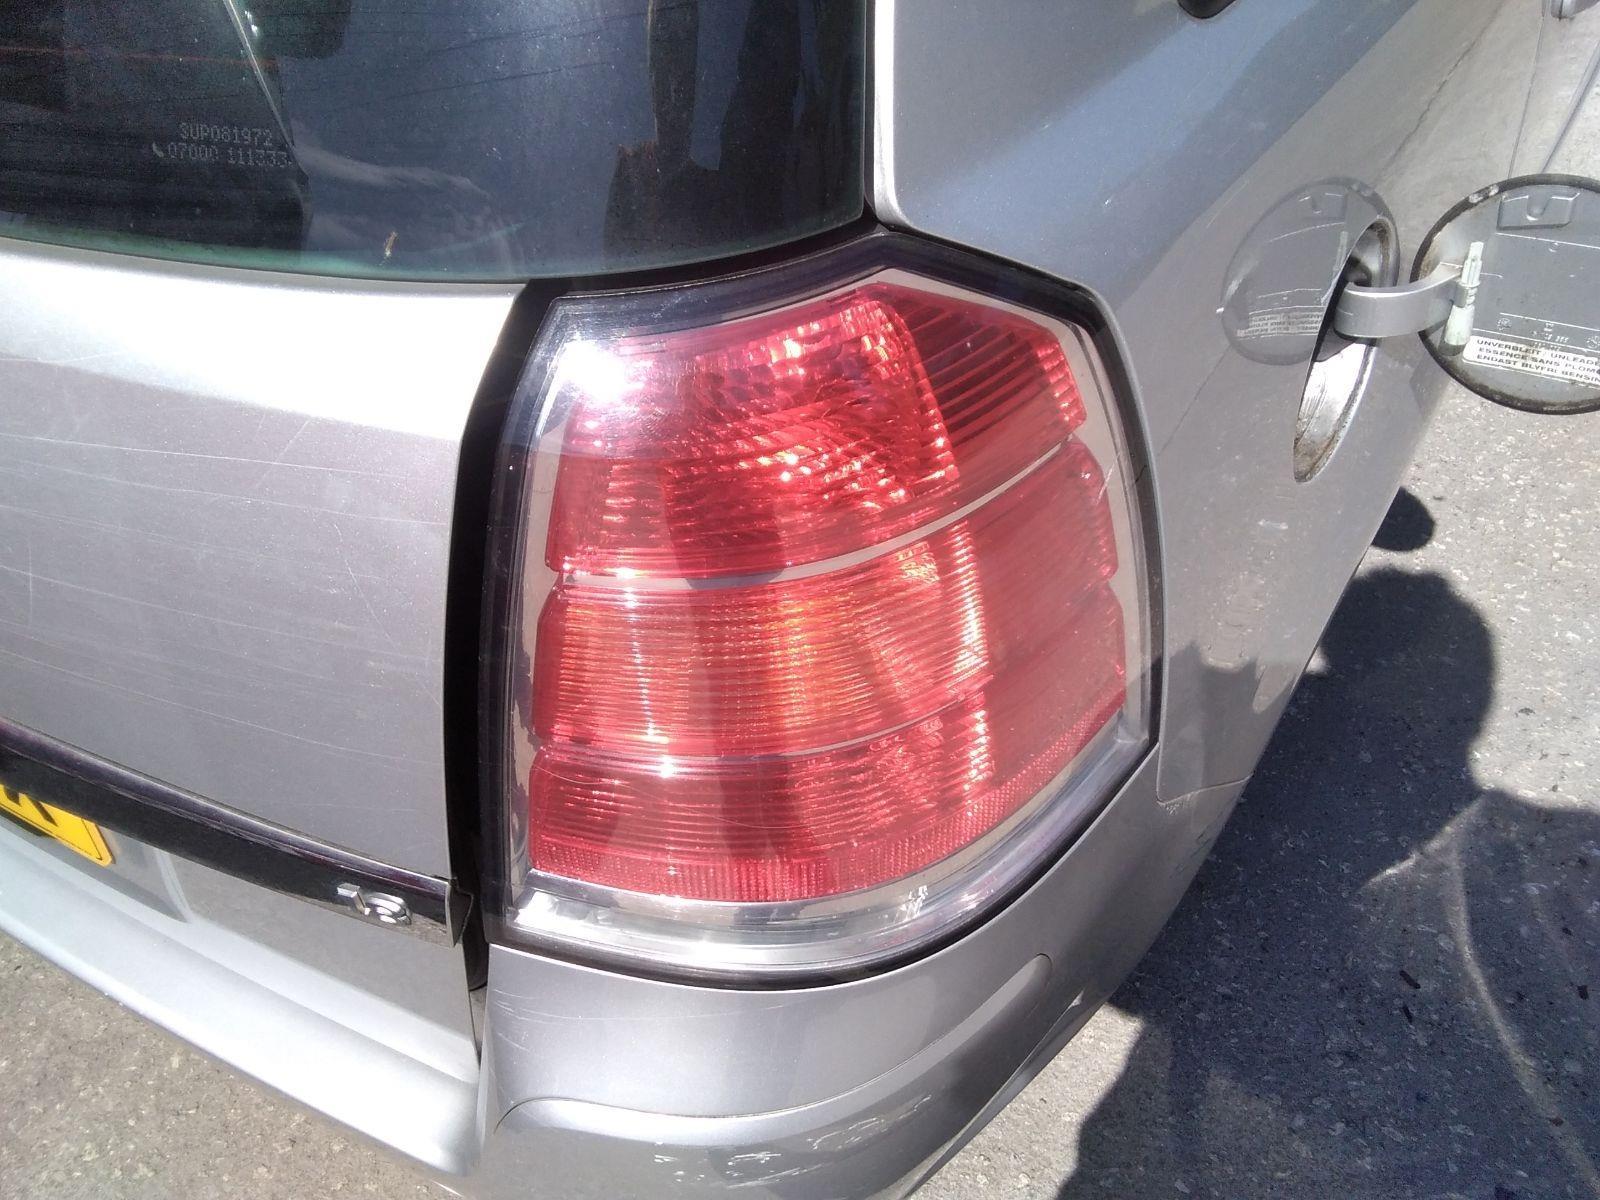 Vauxhall, Zafira 2005 To 2010, Active M.P.V., Petrol Manual Lamp Assembly Rear RH